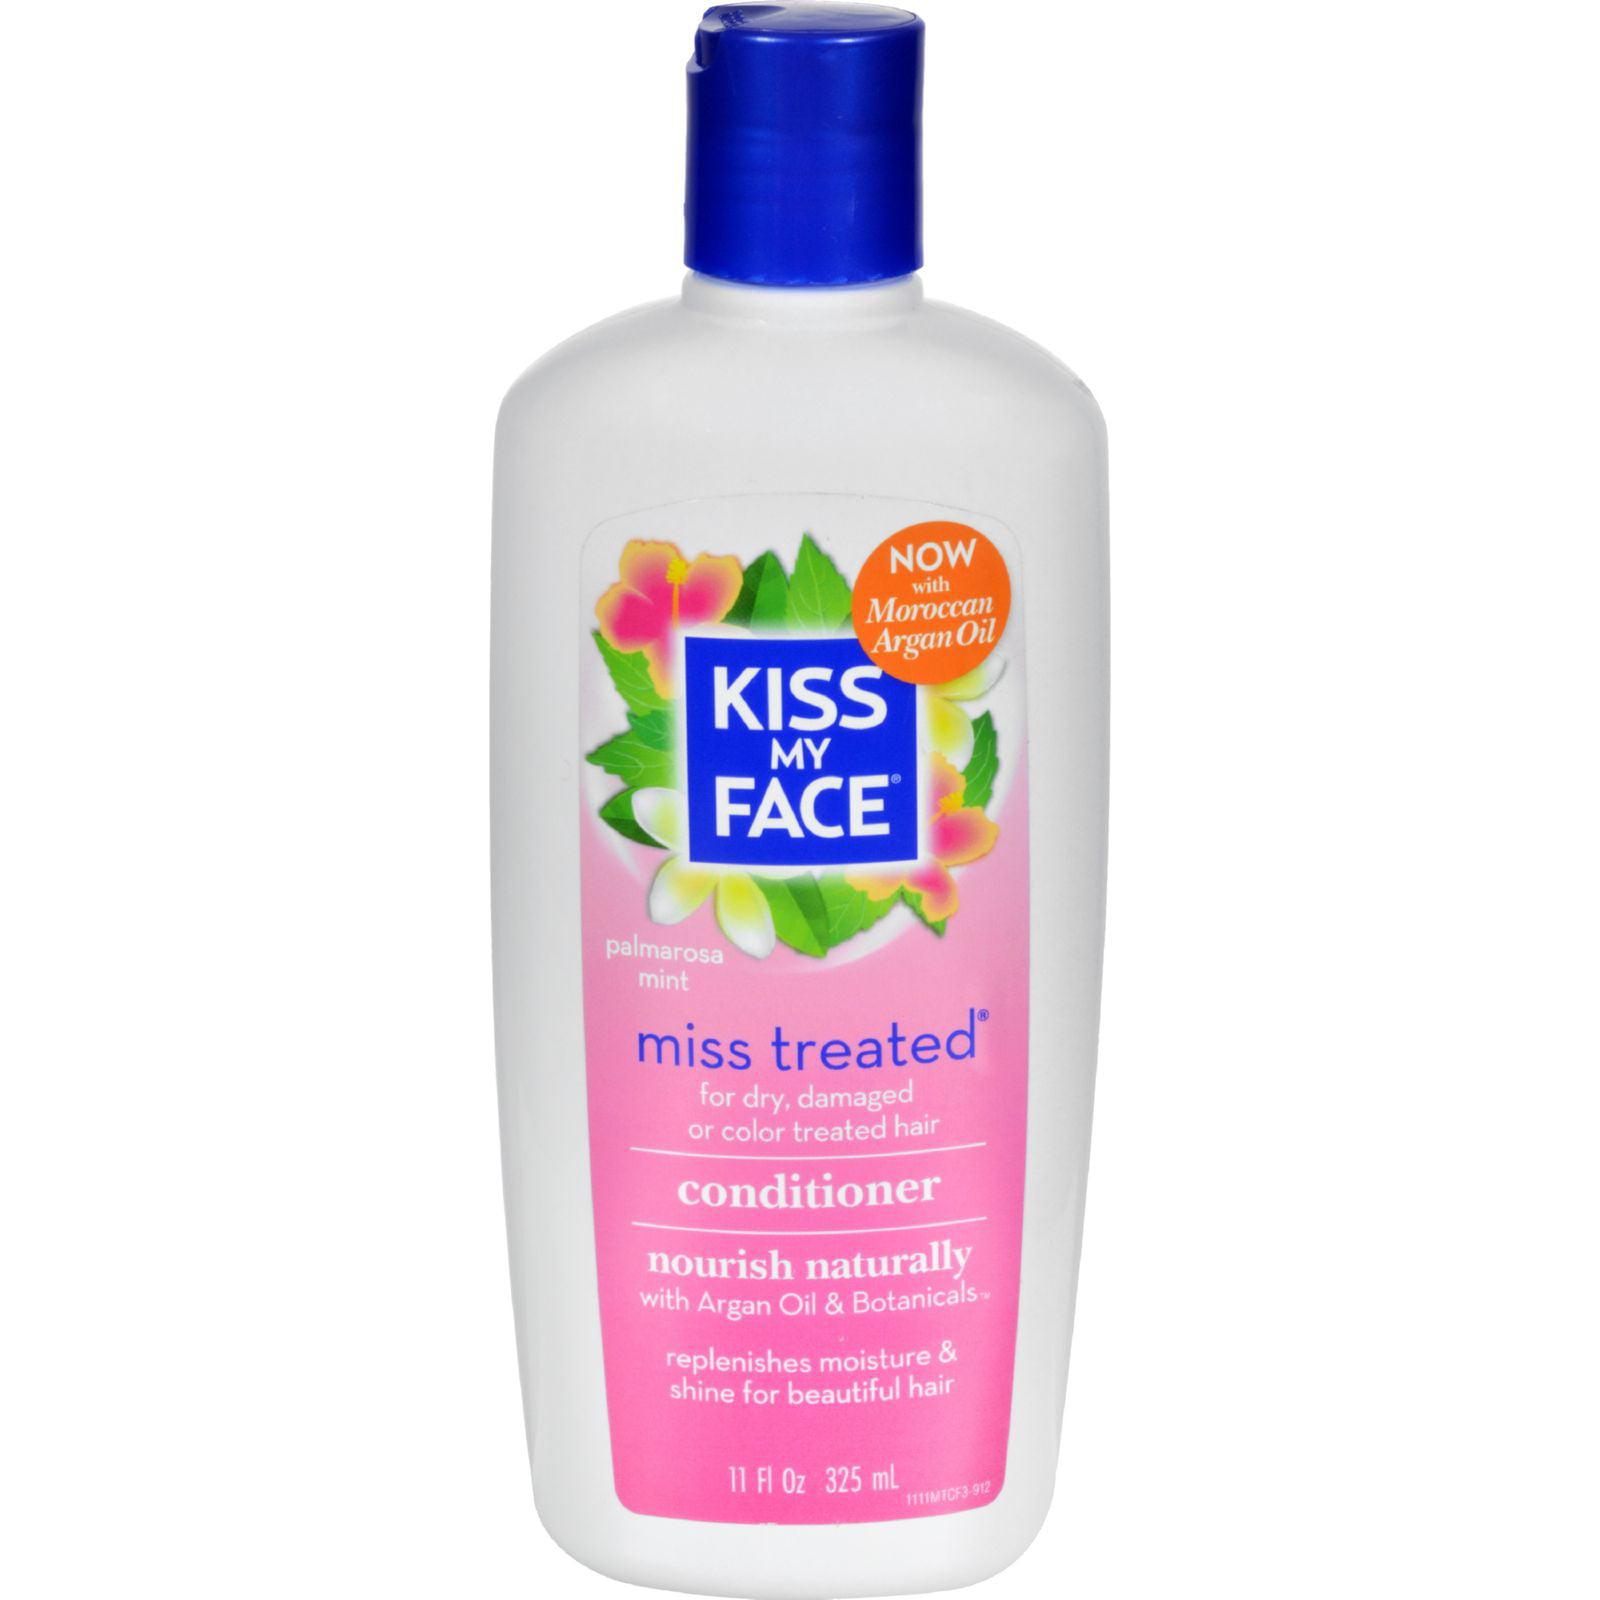 Kiss My Face Miss Treated Conditioner Palmarosa Mint - 11 fl oz